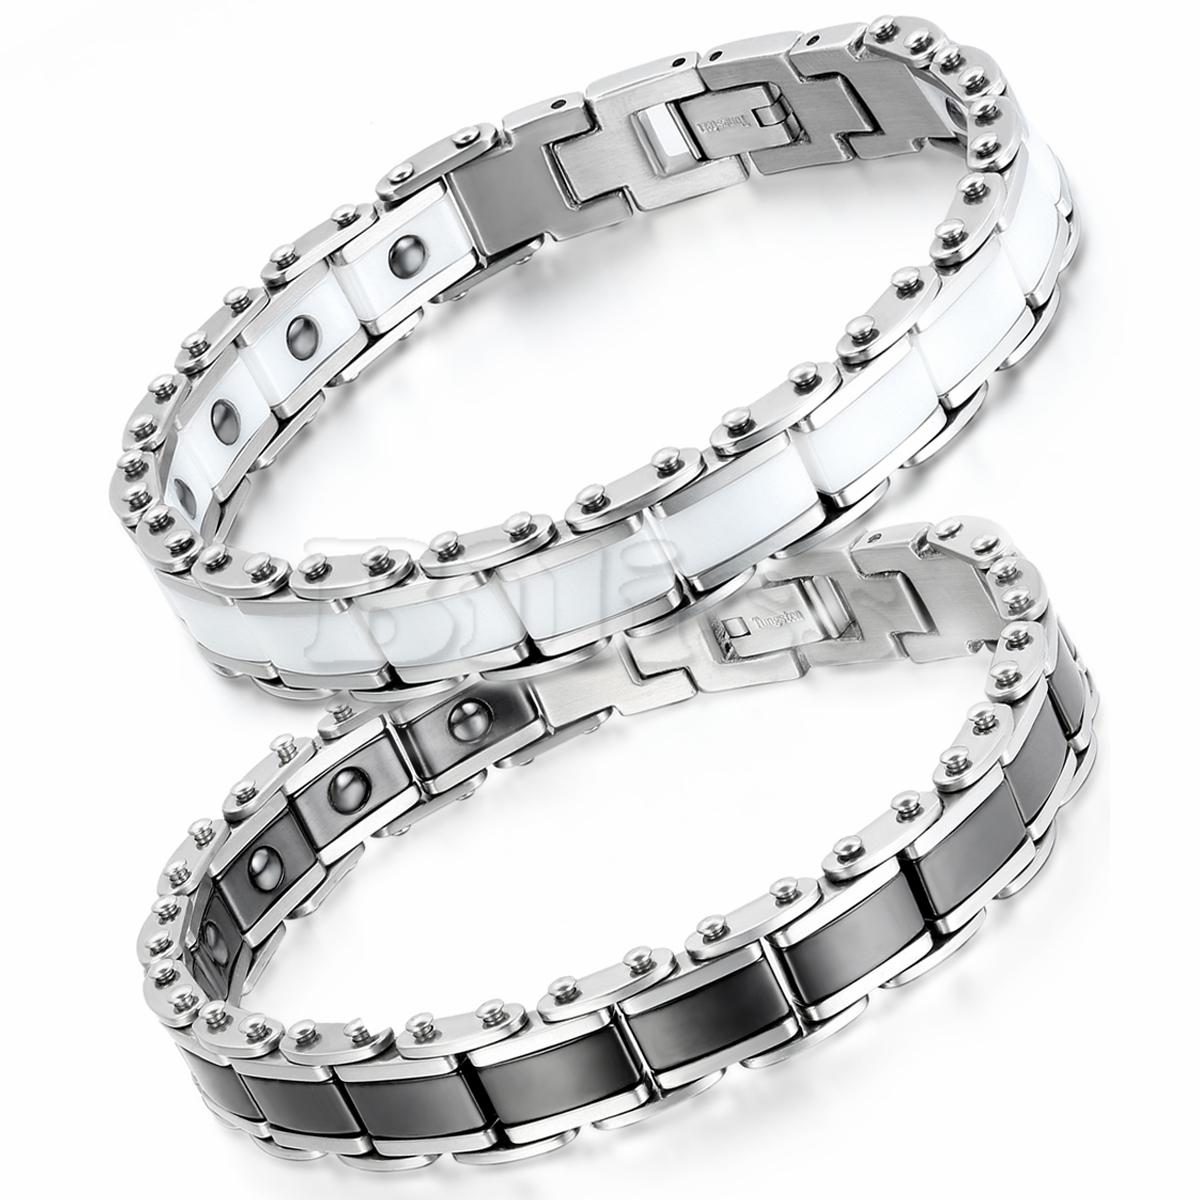 20cm Stainless Steel Black White Ceramic Bracelet Bioenergy Bangle Magnetic Germanium Health Jewelry For Men pulseira masculina(China (Mainland))